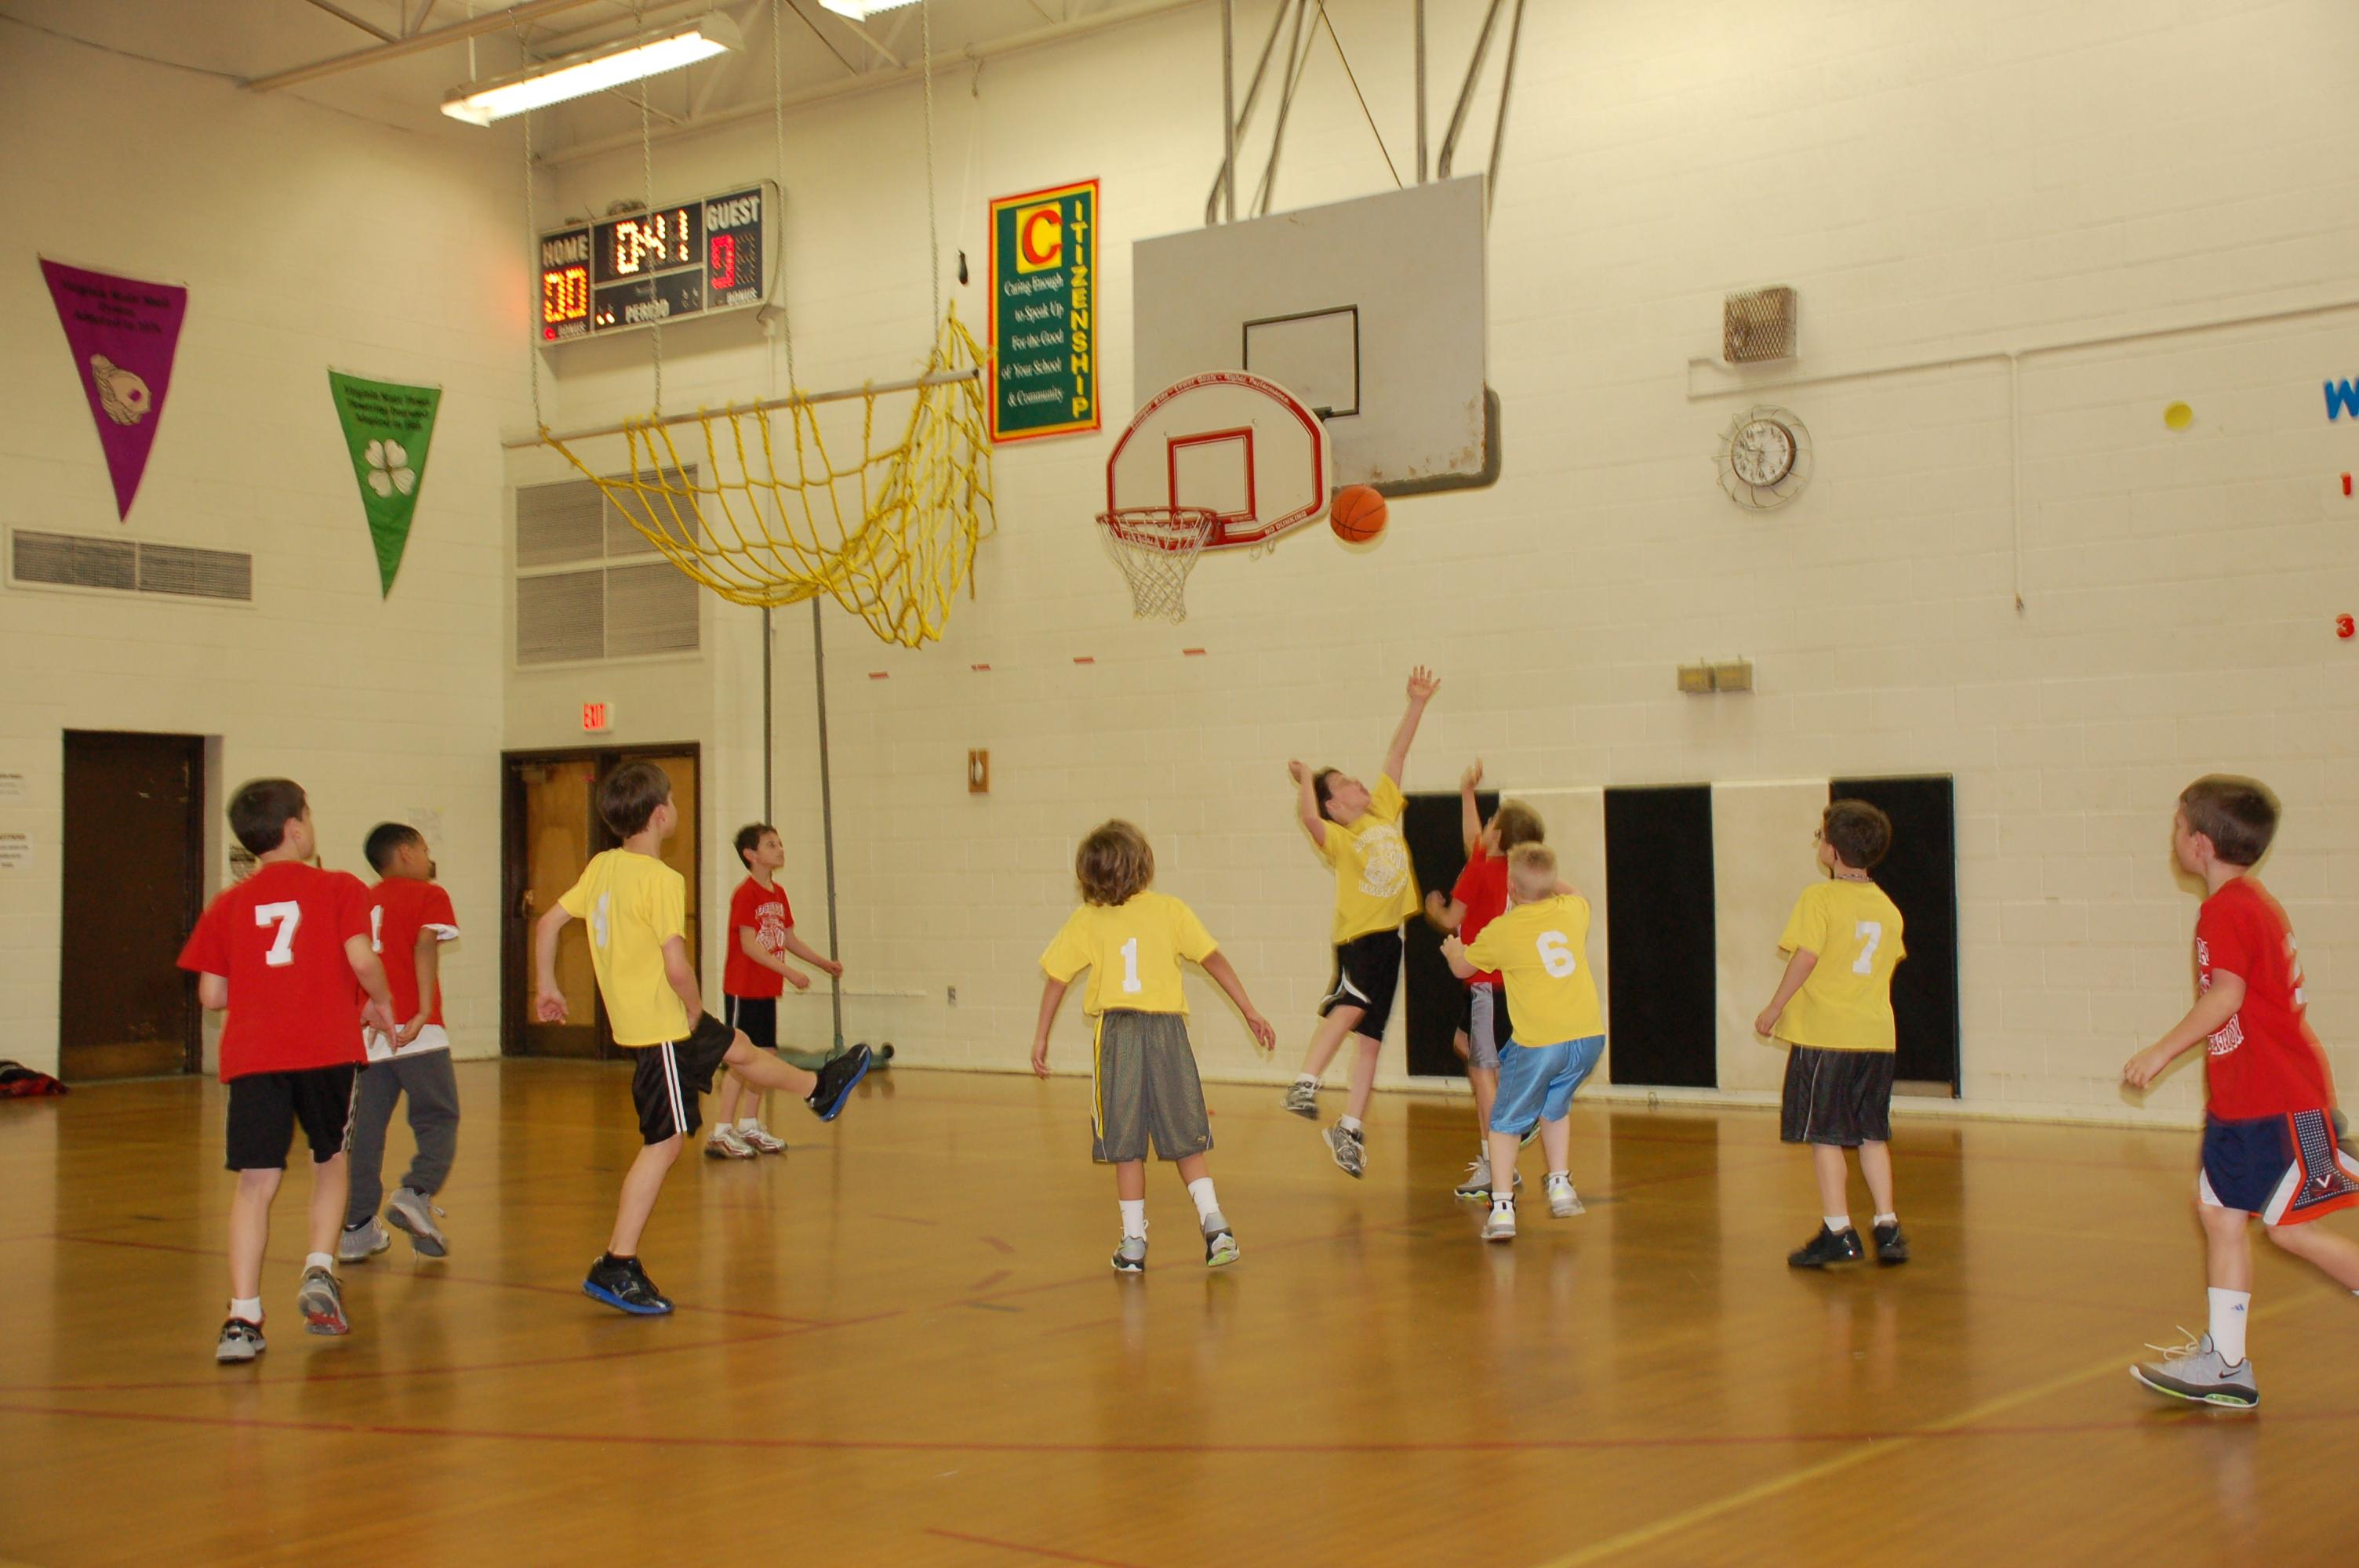 Youth basketball by Bruce Stambaugh